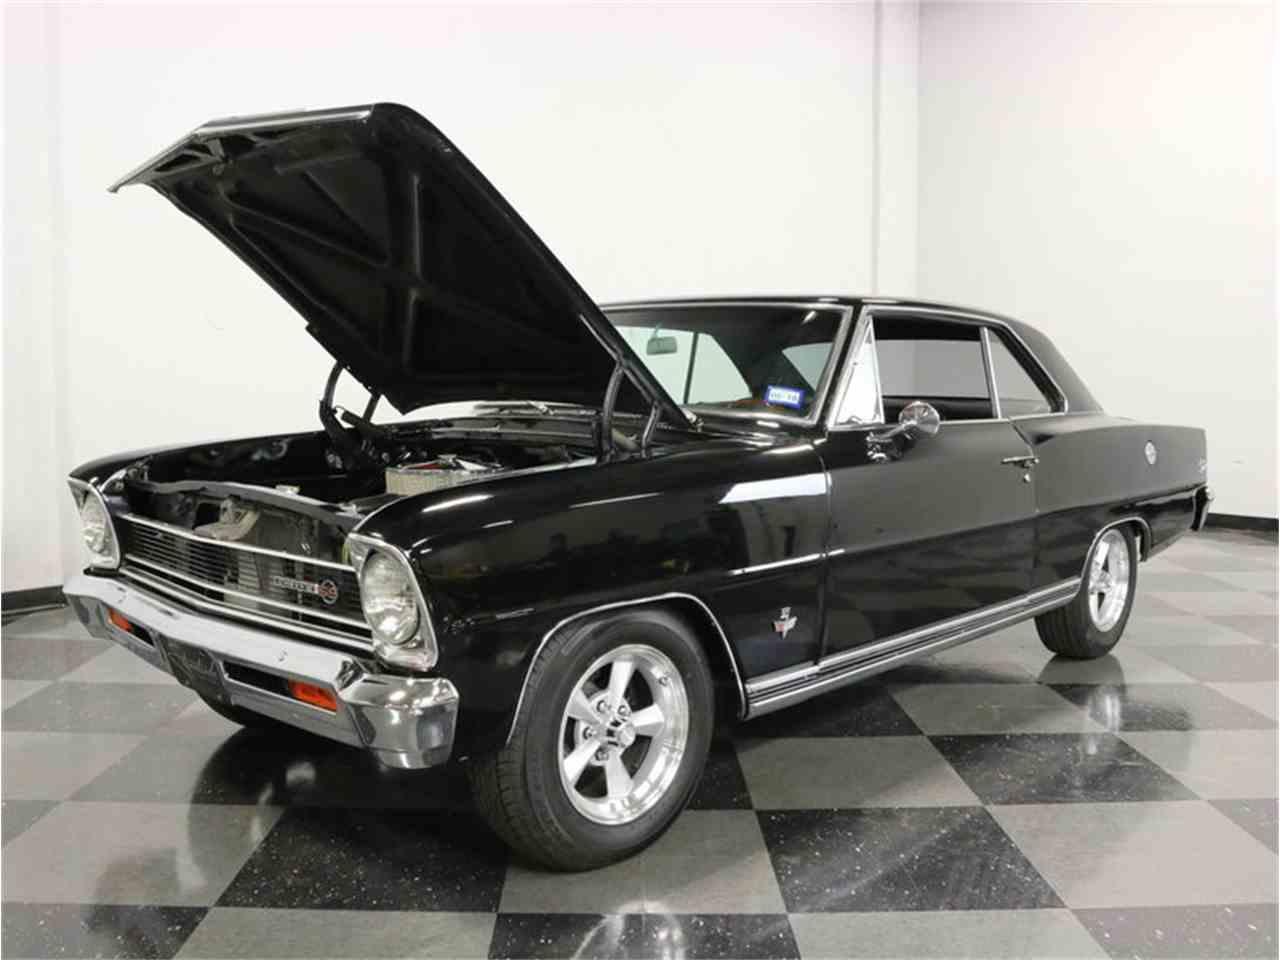 All Chevy black chevy nova ss : 1966 Chevrolet Chevy II Nova SS for Sale   ClassicCars.com   CC ...